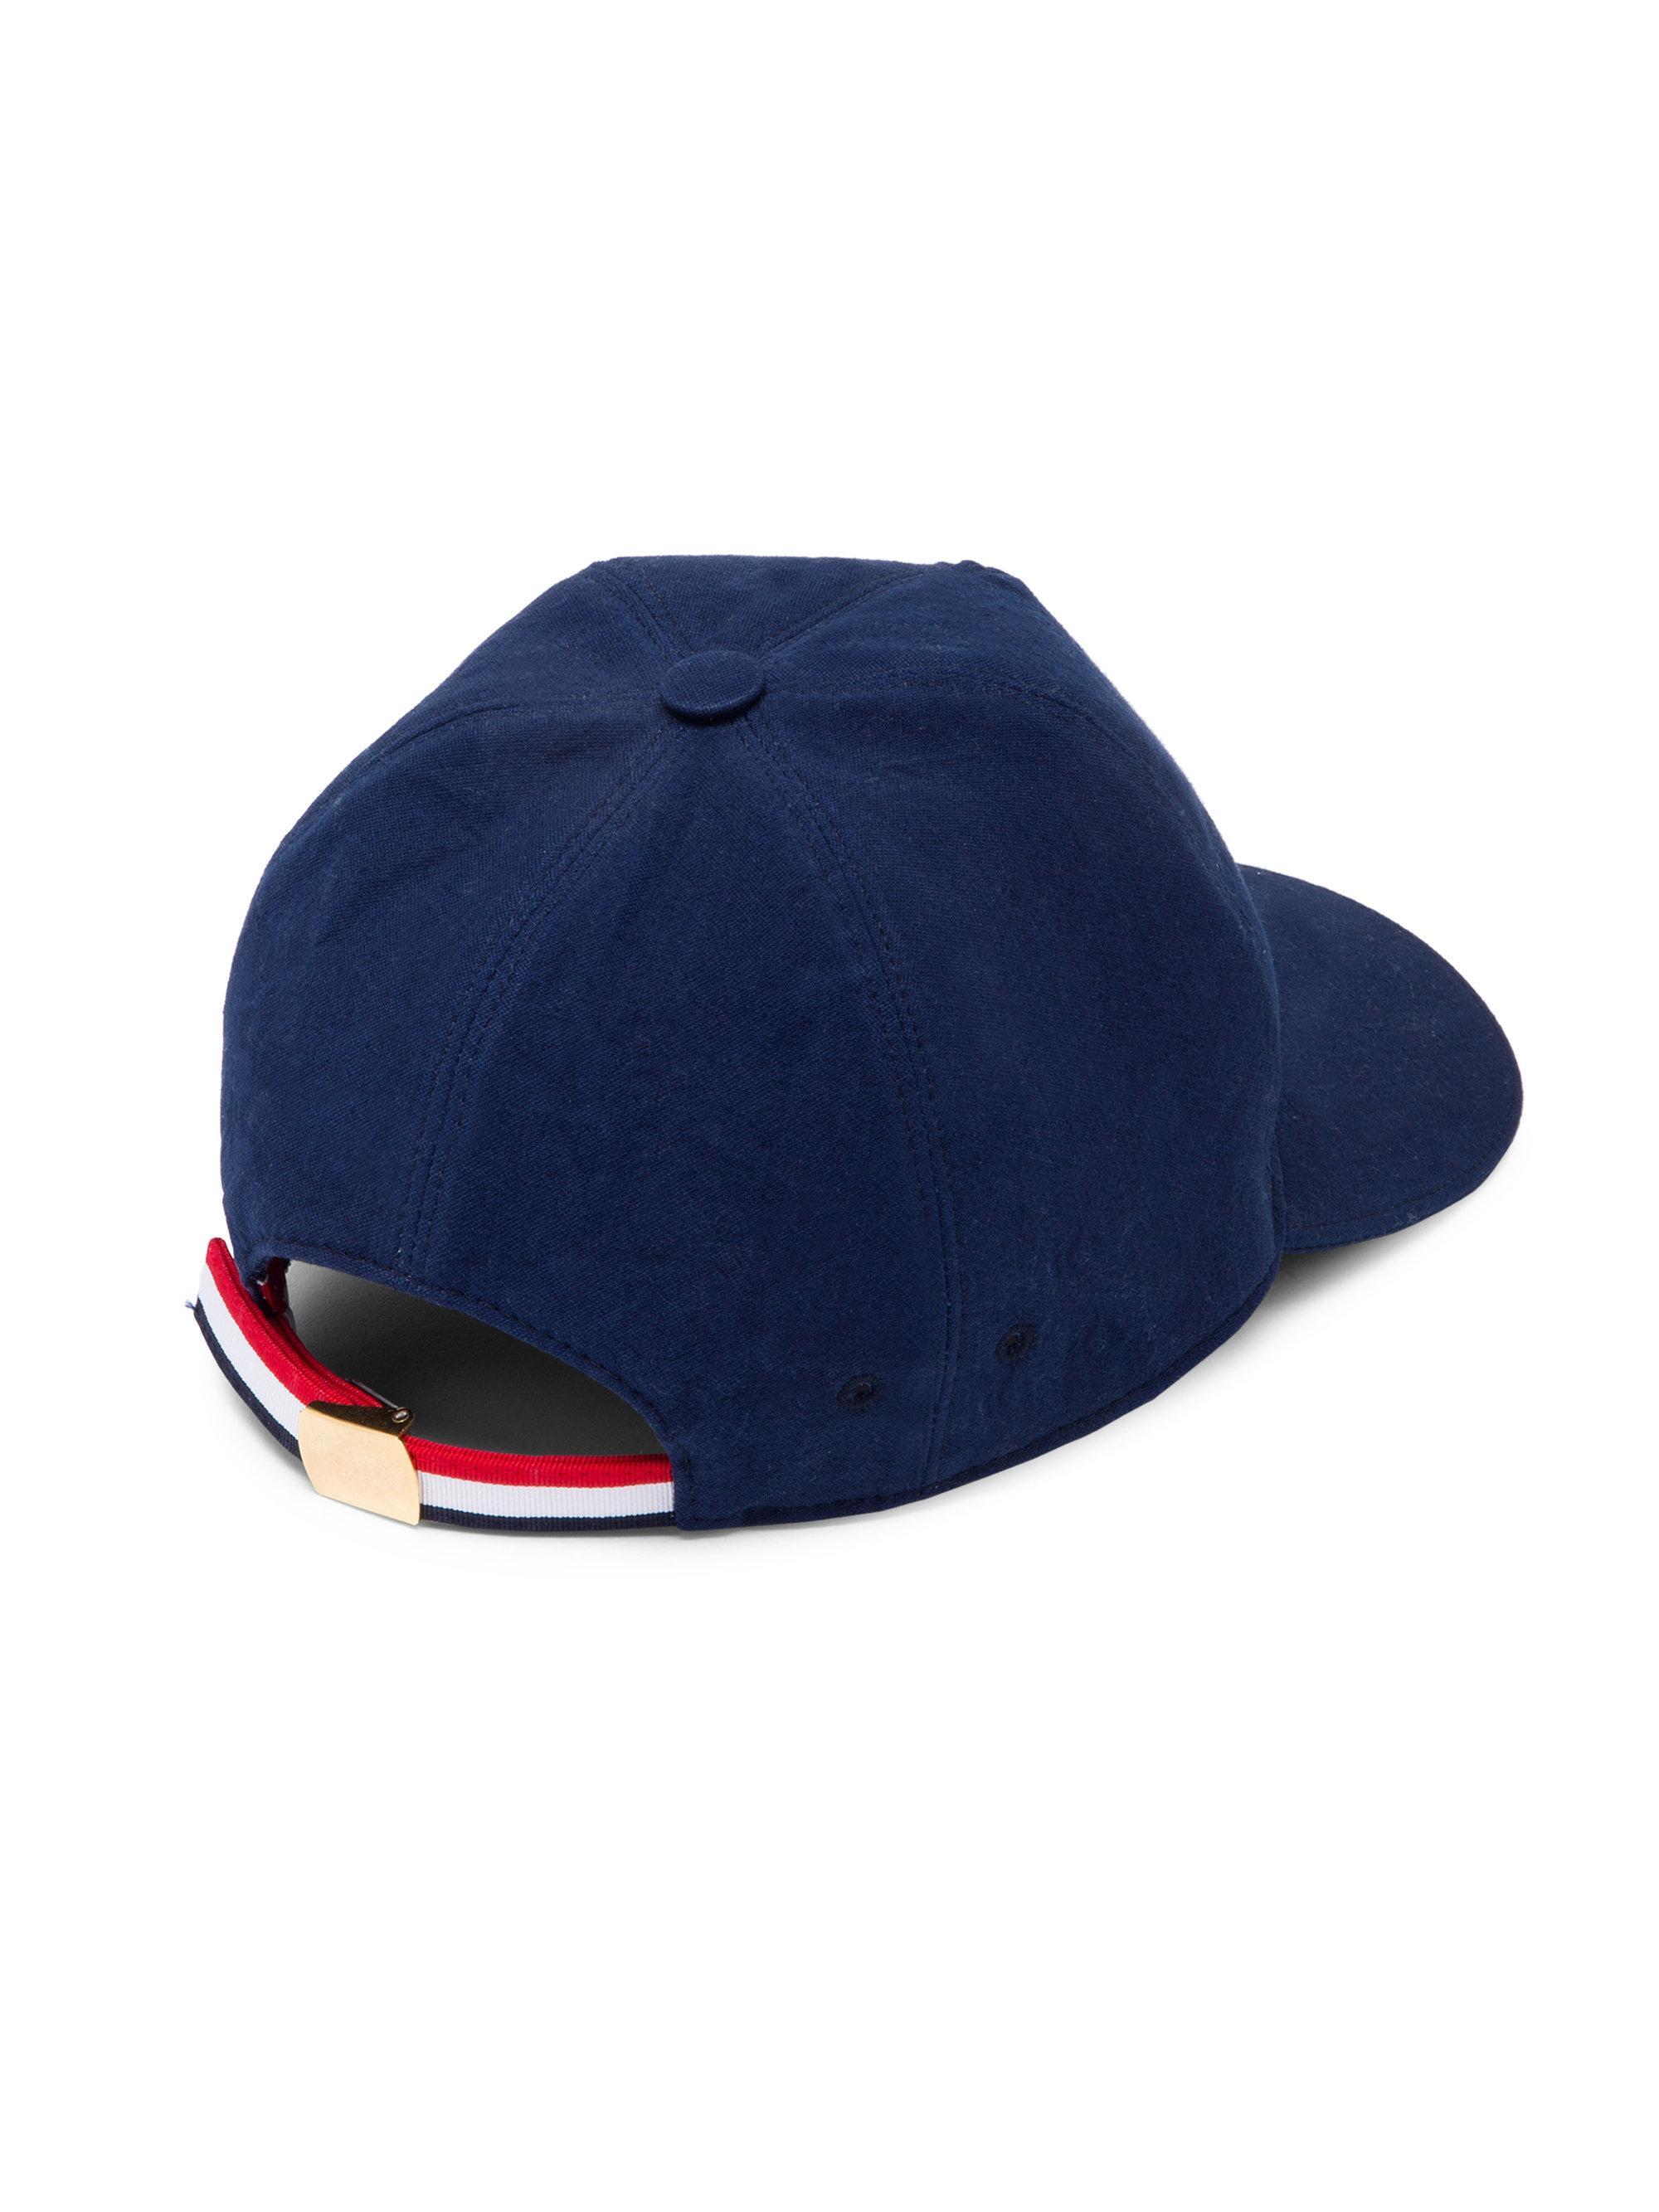 Blue 6-panel baseball cap Thom Browne mczCjWmt2C